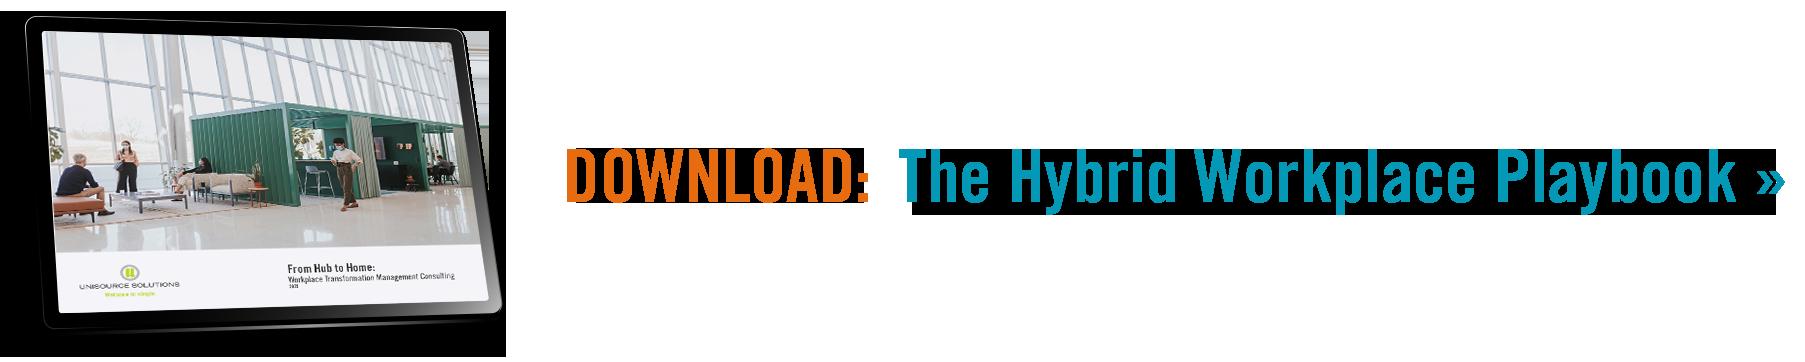 download-hybrid-playbook-banner